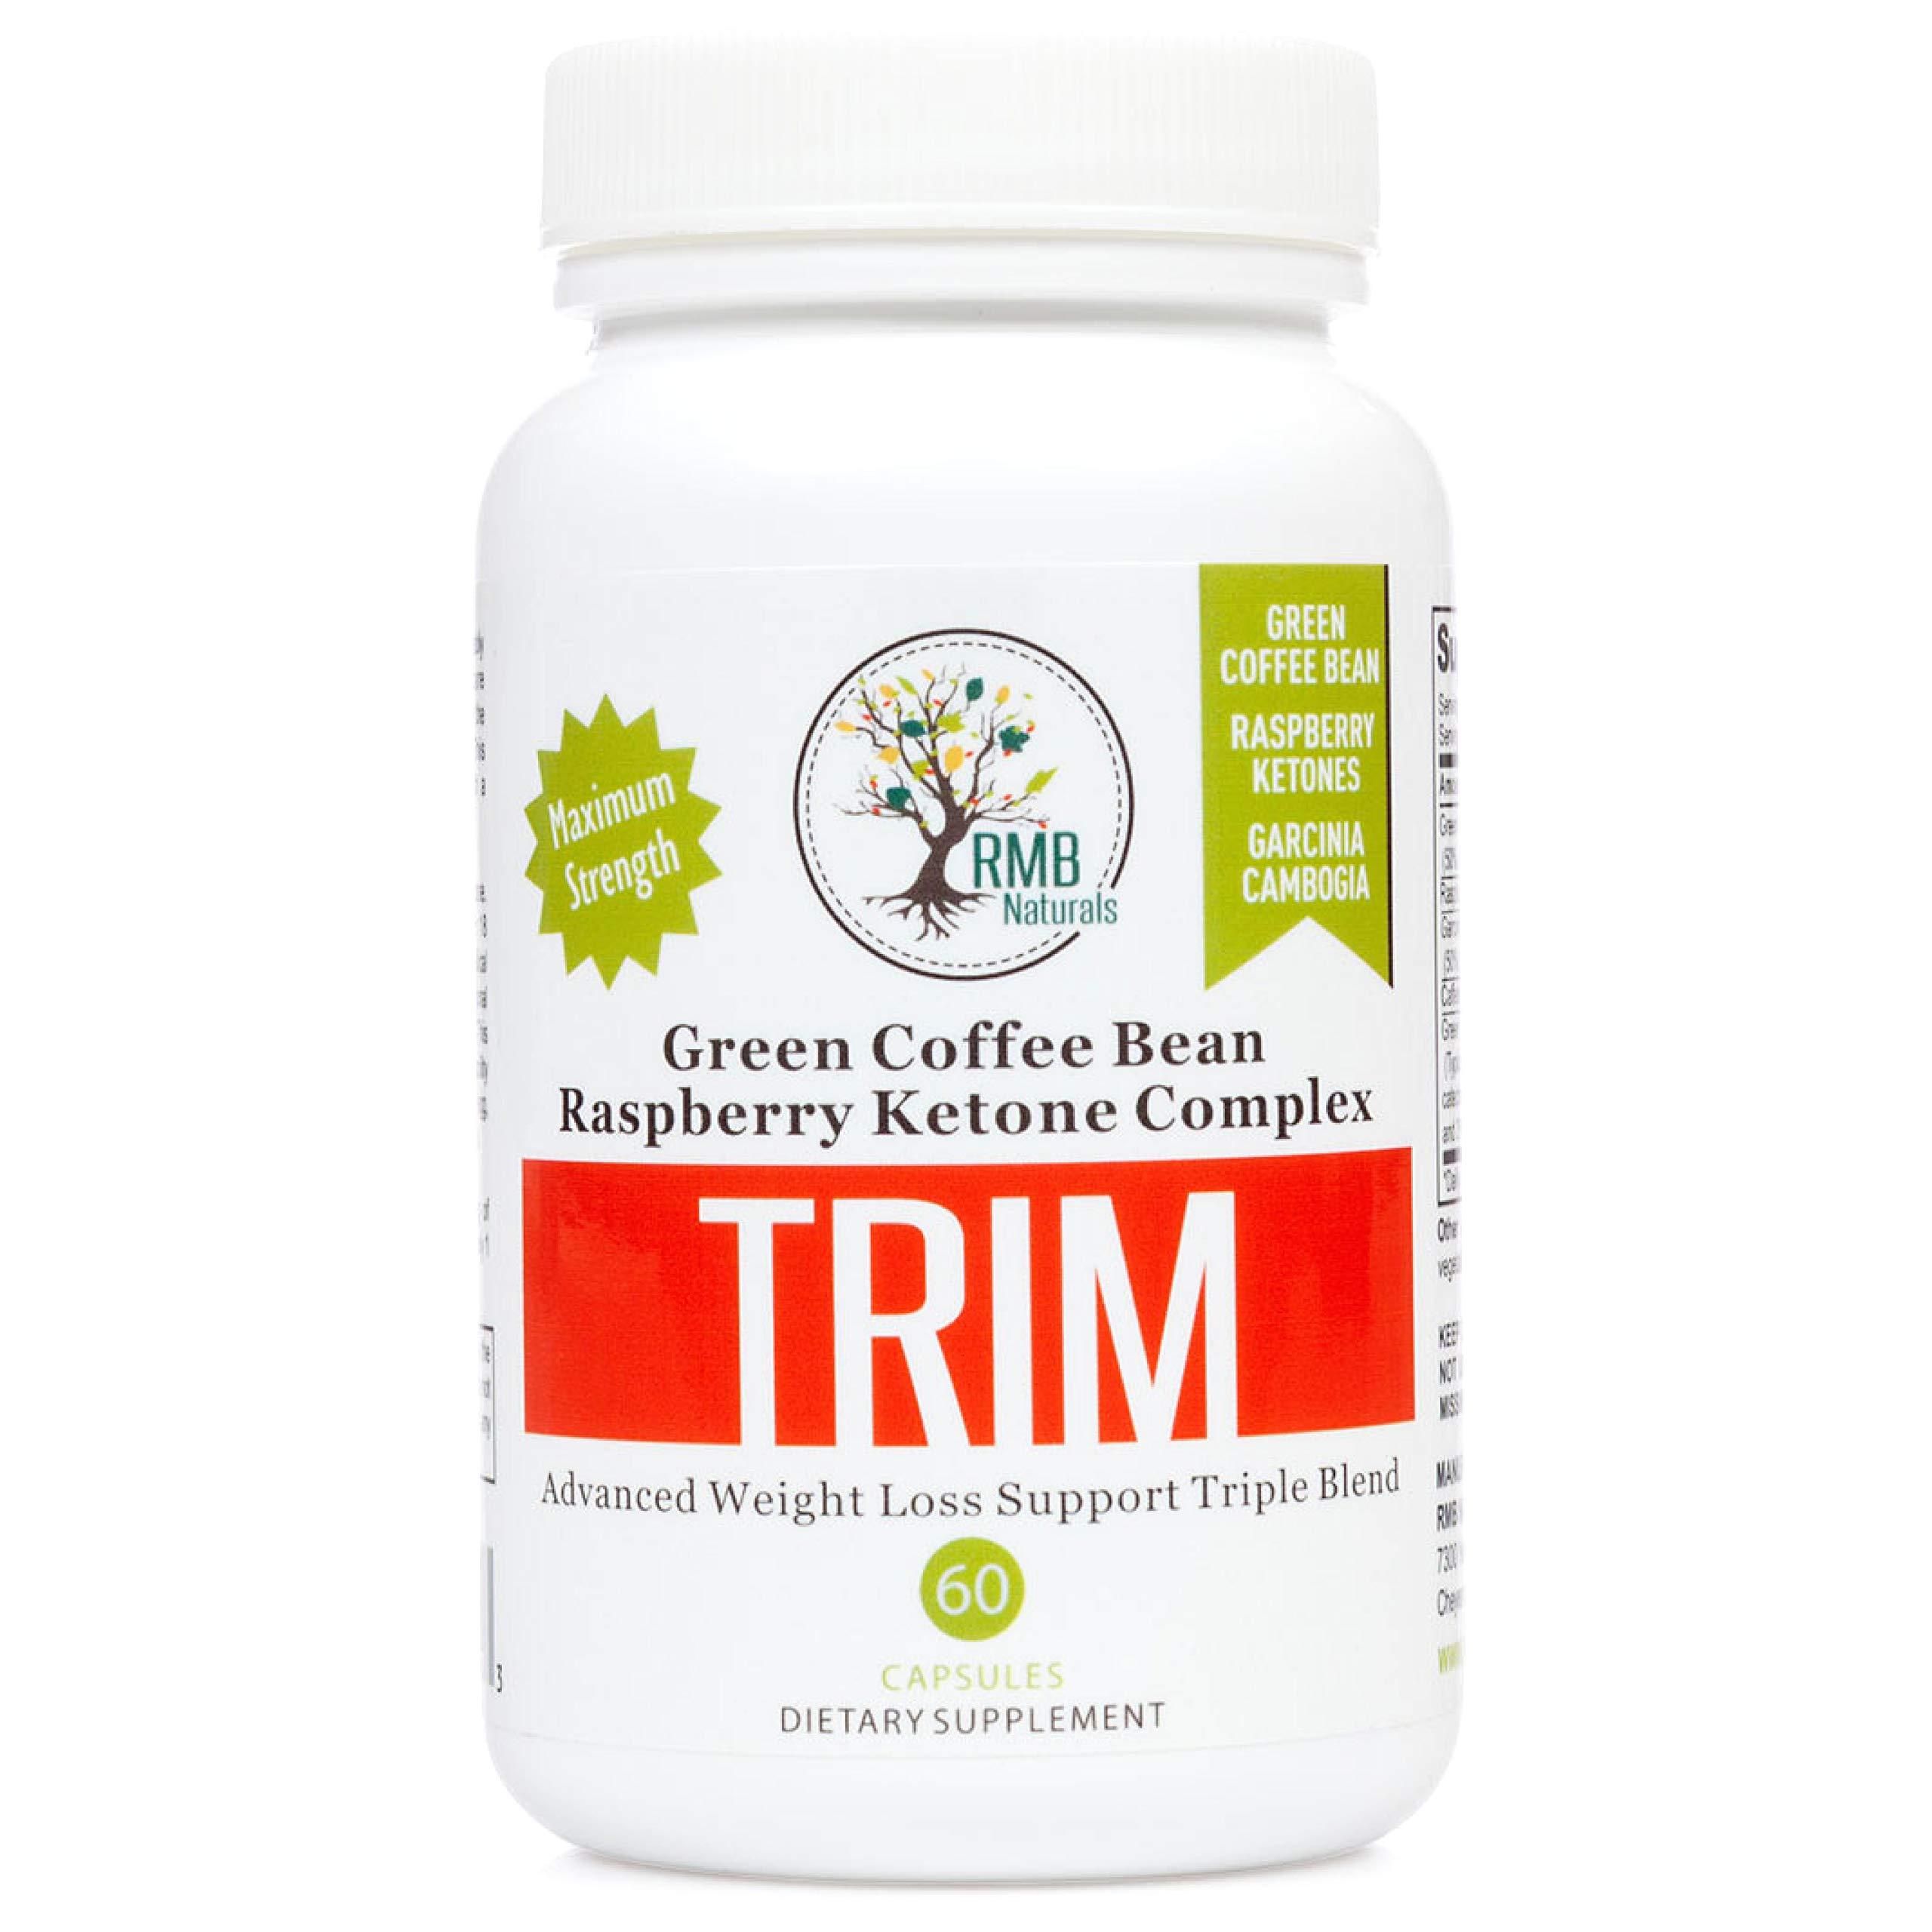 Garcinia Cambogia TRIM plex Green Coffee Bean Raspberry Ketones Fat Burning Weight